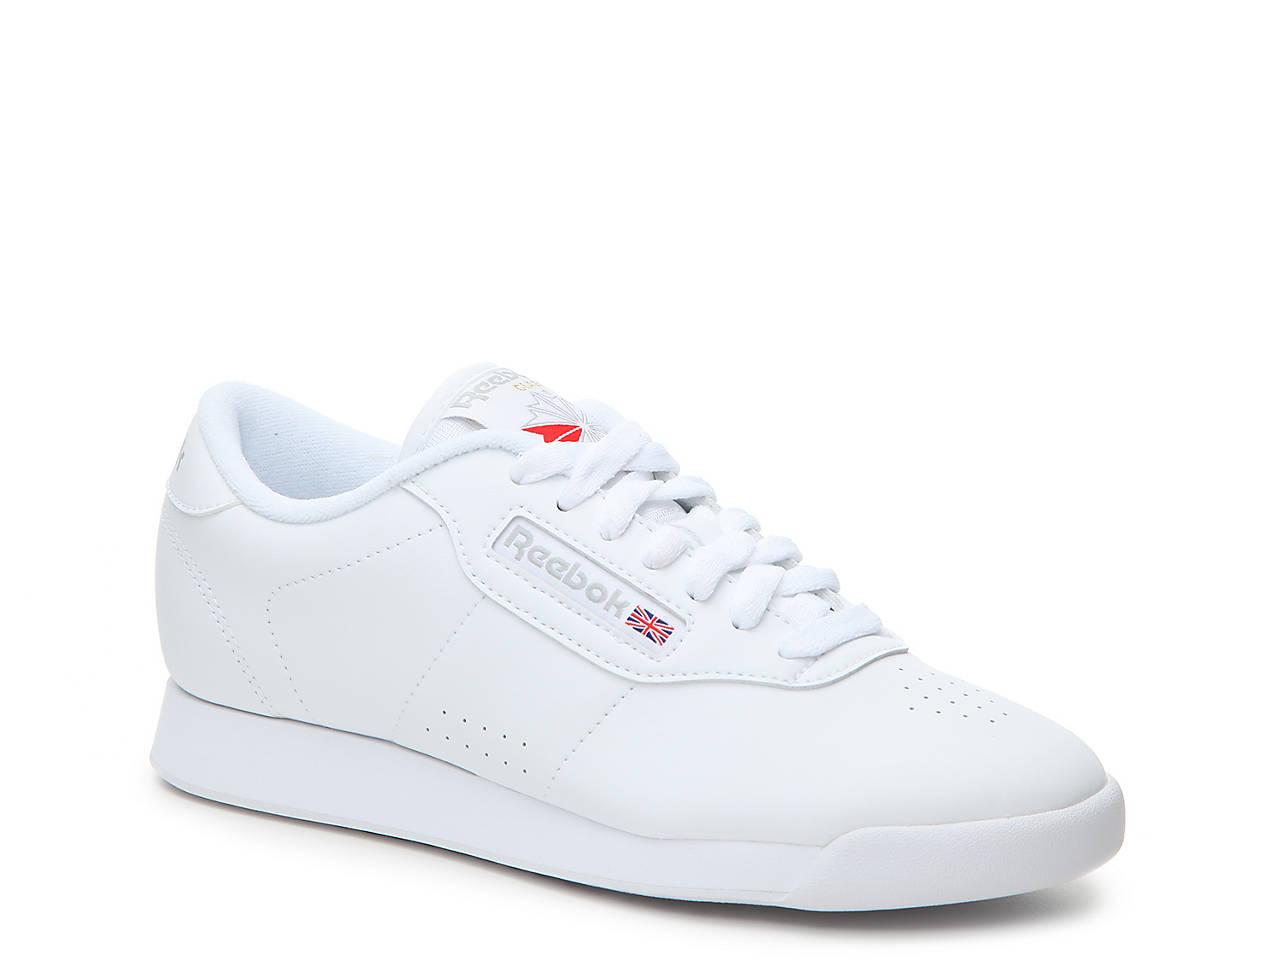 2d667b4f8183 Reebok Classic Princess Sneaker - Women s Women s Shoes